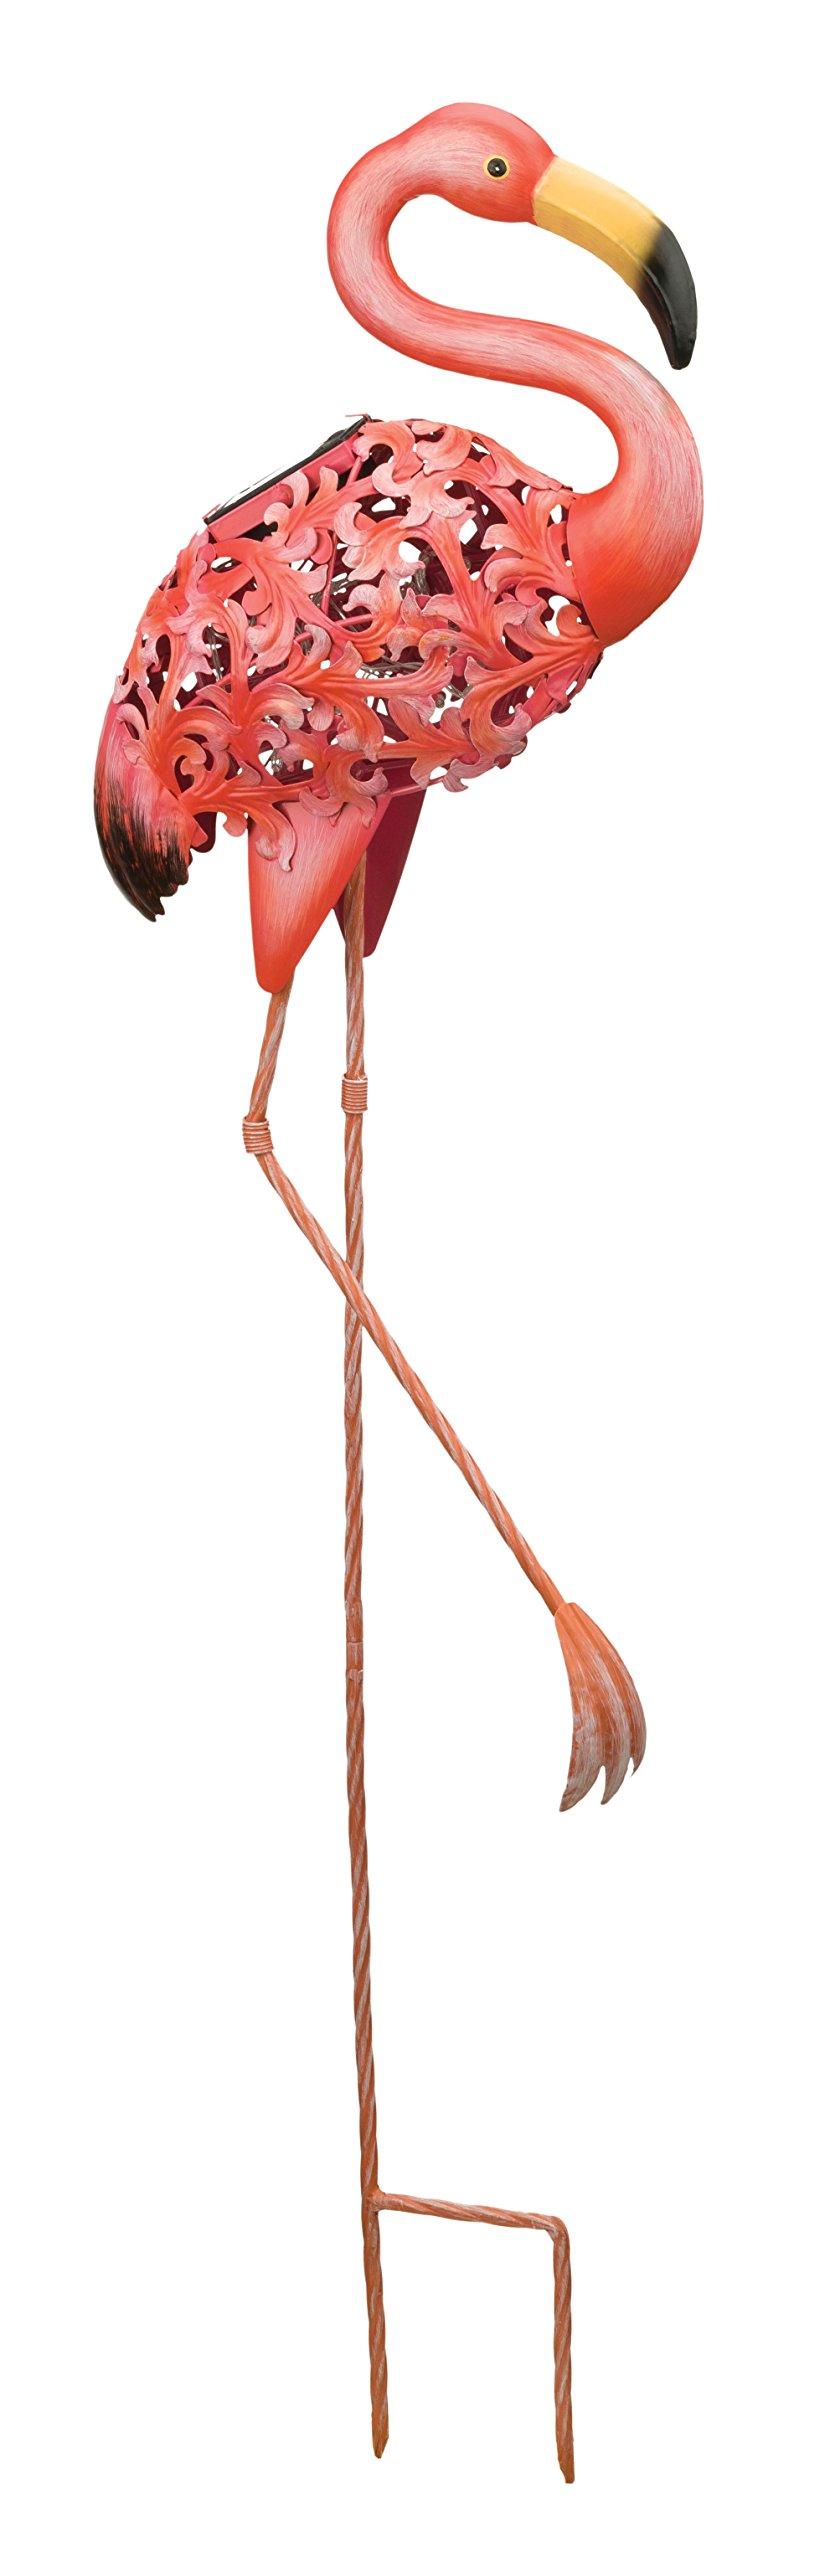 Regal Art & Gift Solar Bird Stake - Flamingo